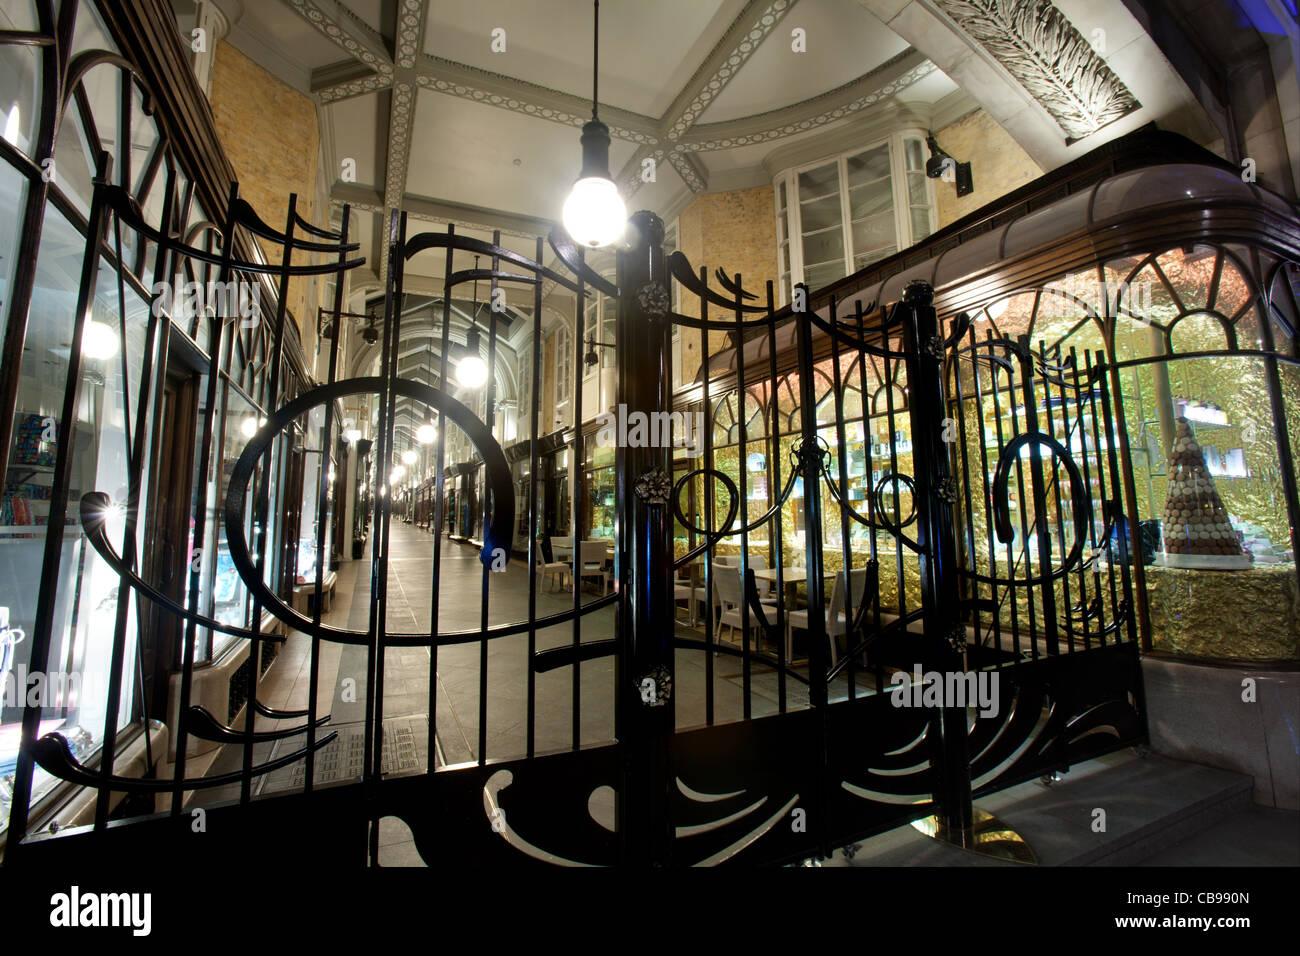 The Burlington Arcade, London, UK - Stock Image